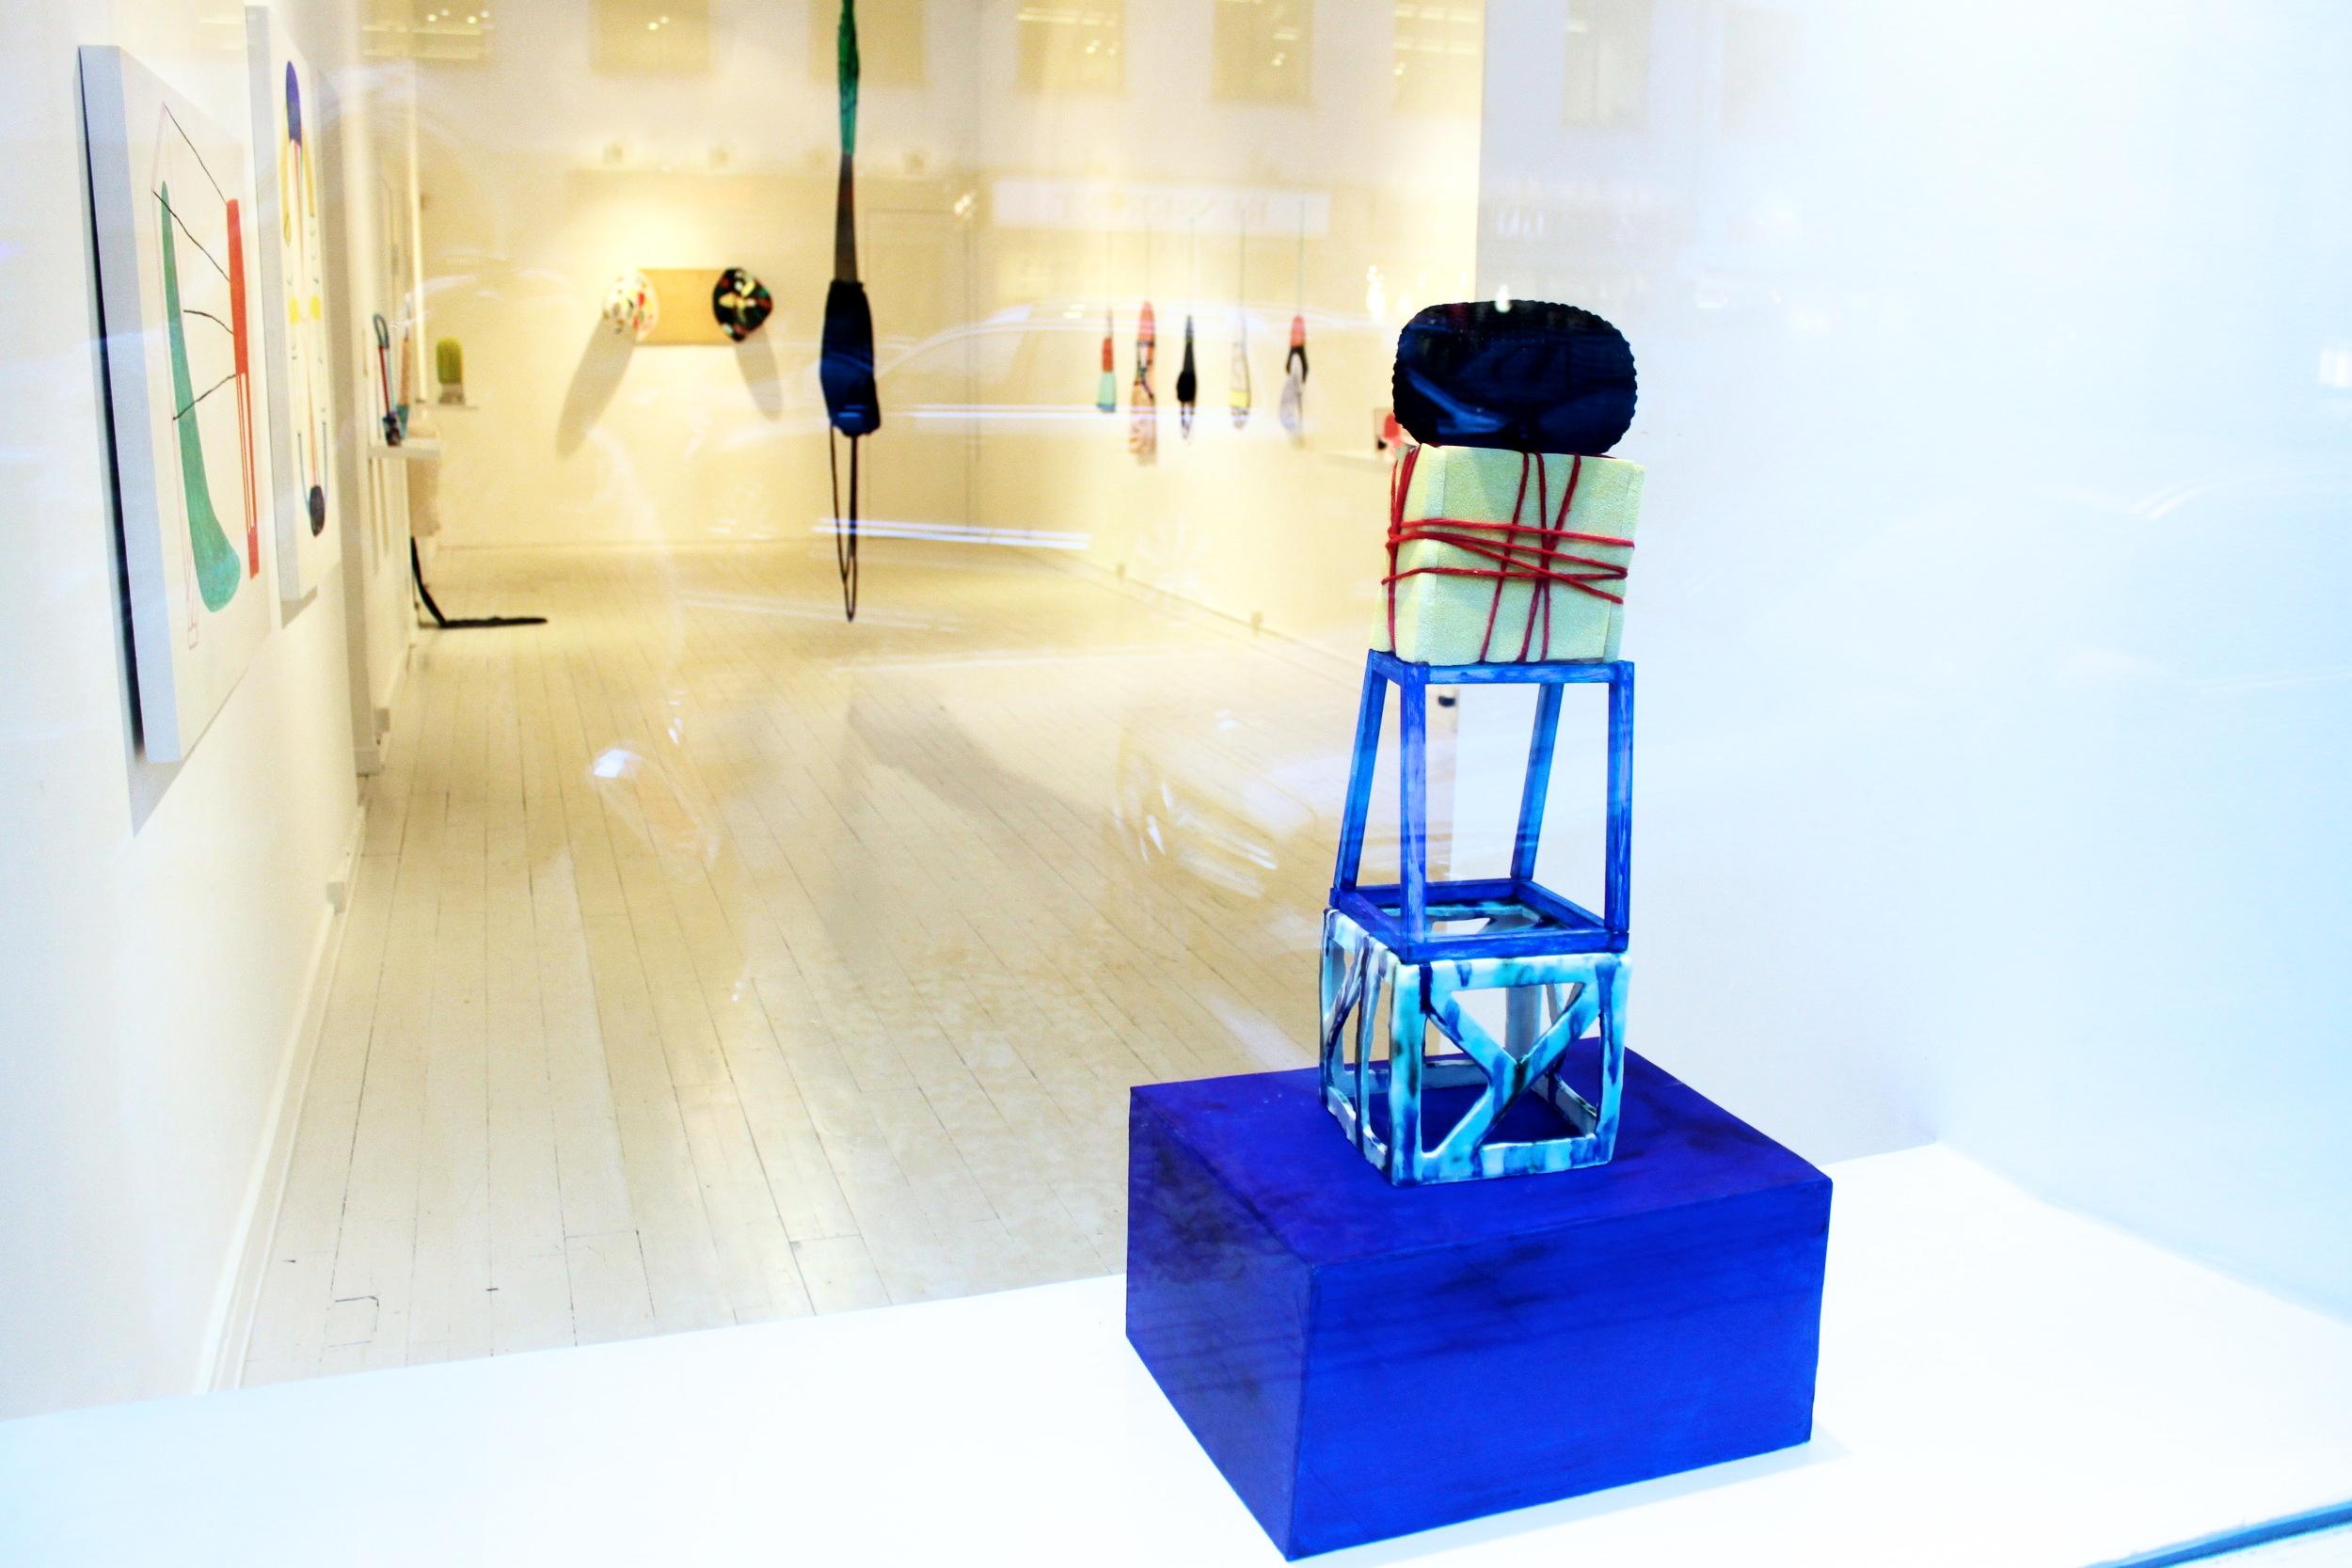 """Tower of inner power"" Ceramics, wood, foam, knitwork, yarn. 54 x 17 x 18 cm. 2016.Originals"" Galerie Pi. 2016"